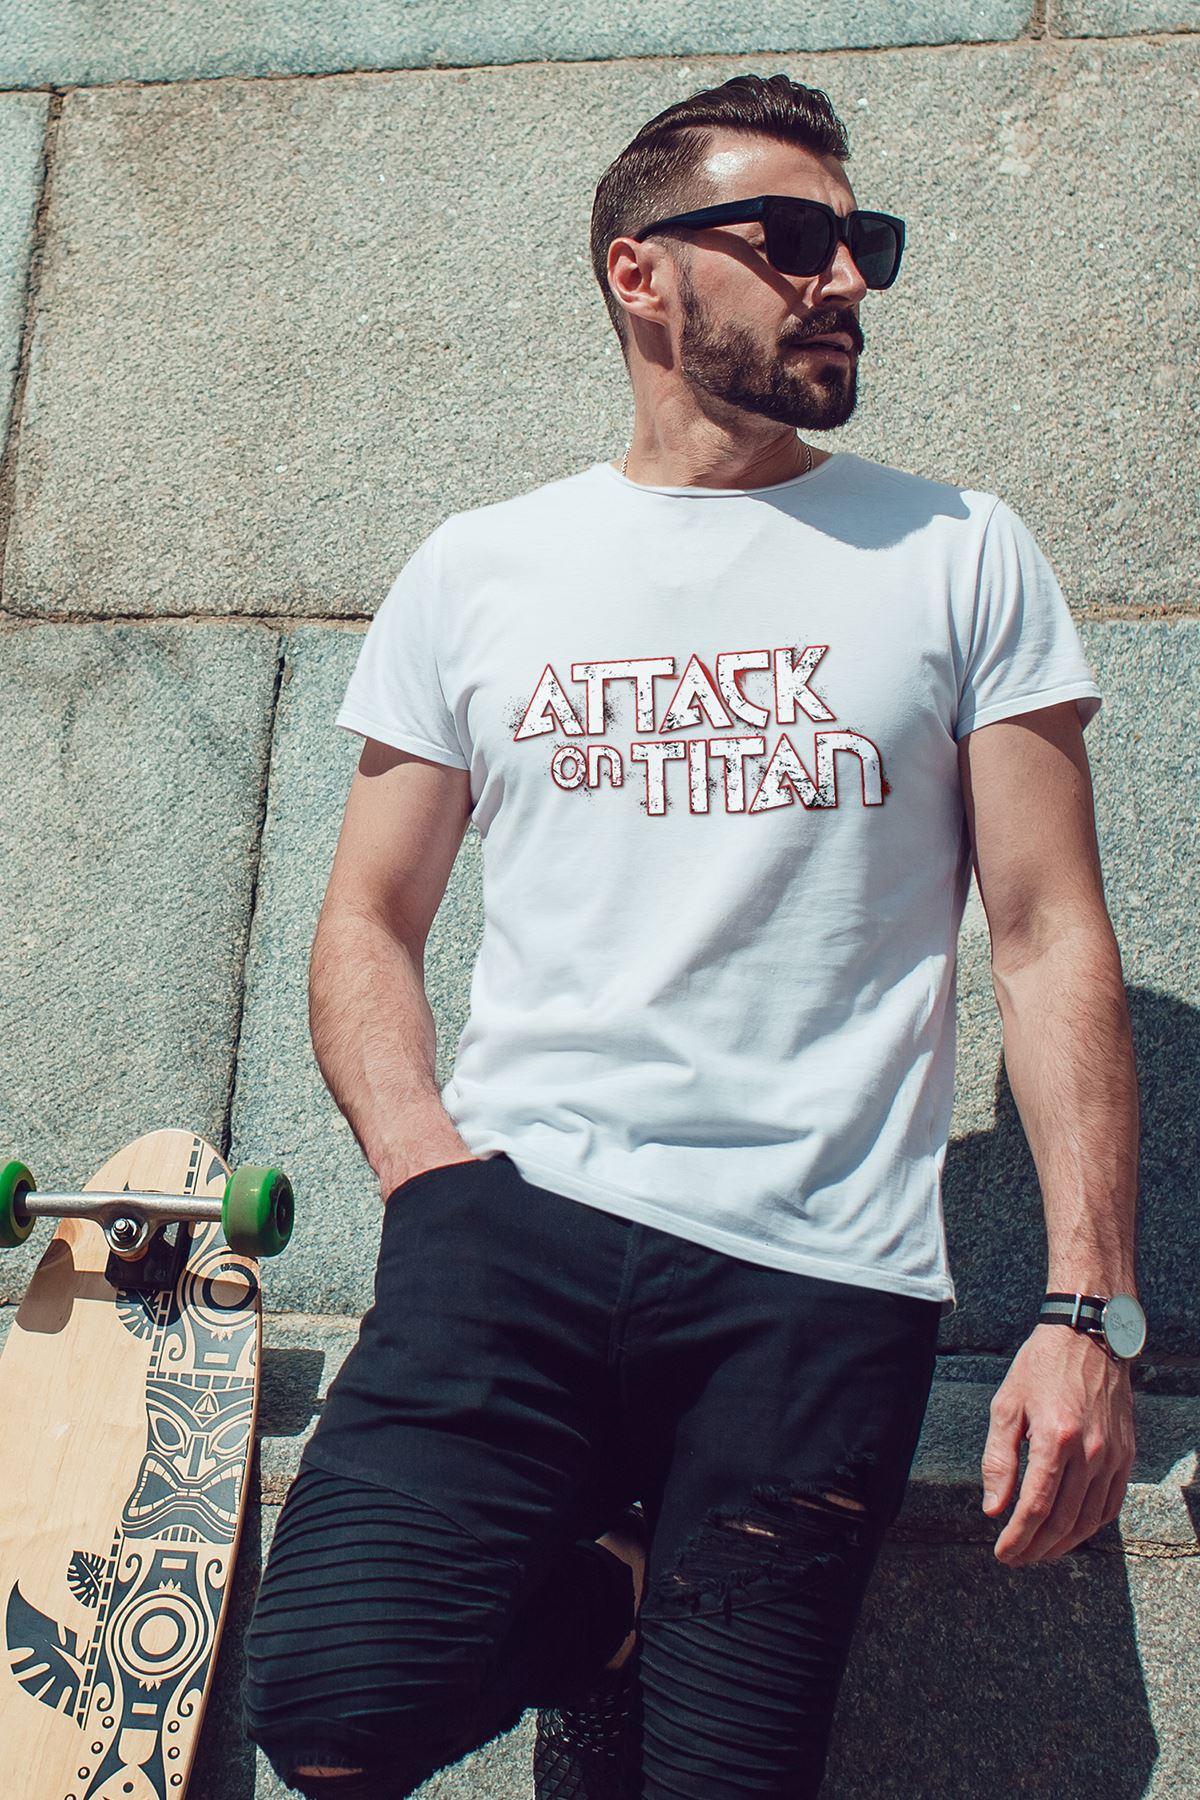 Attack on Titan Beyaz Erkek Tshirt - Tişört